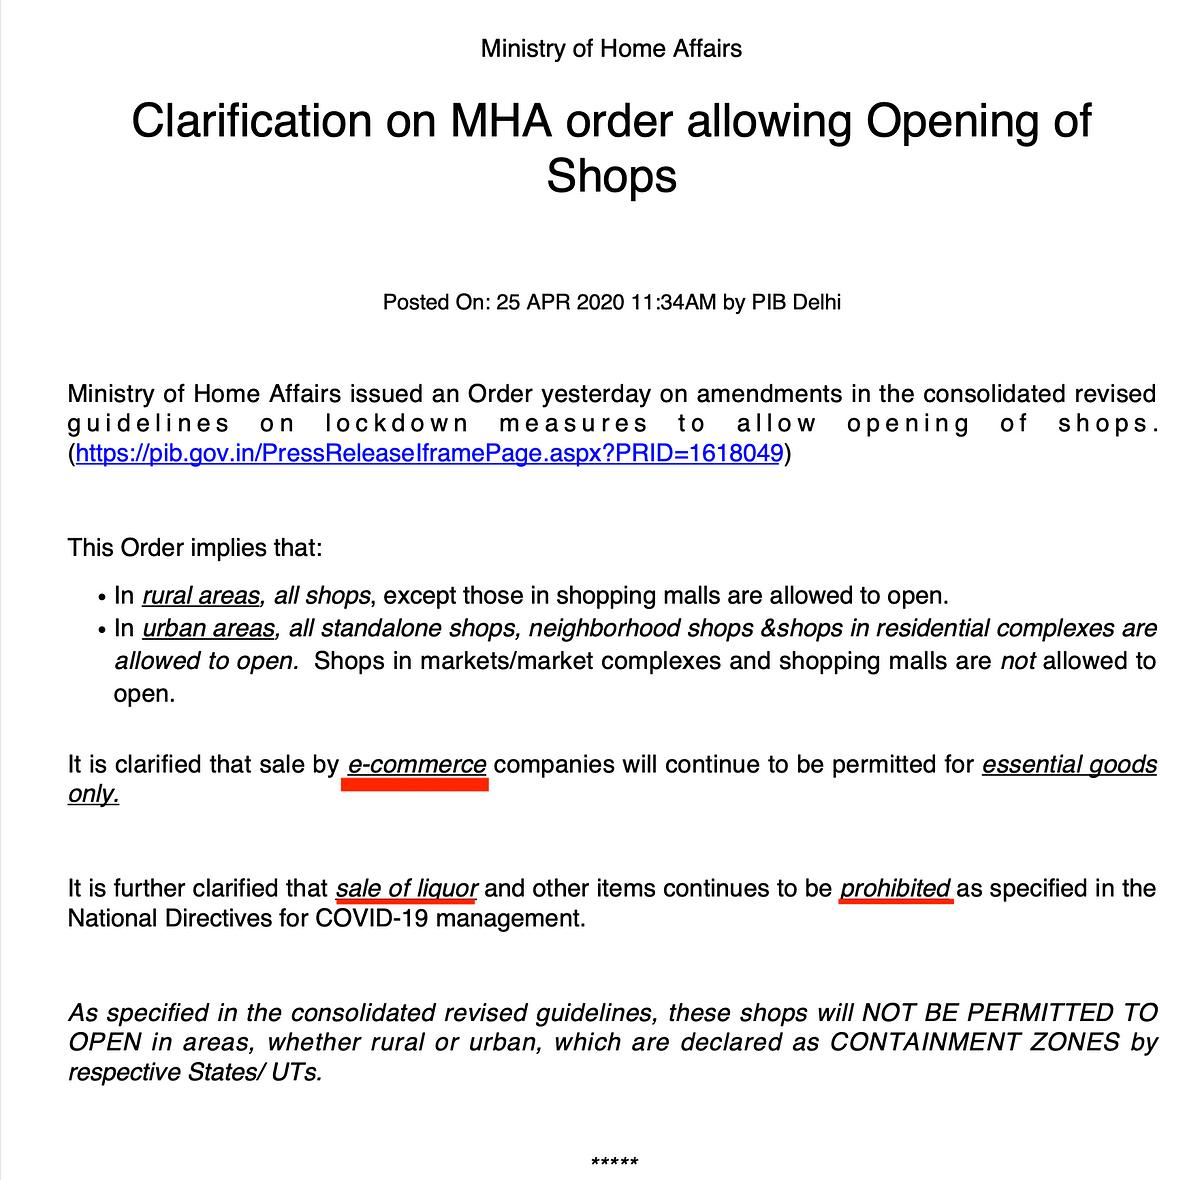 Updated MHA Clarification at 11.34 AM (April 25, 2020)